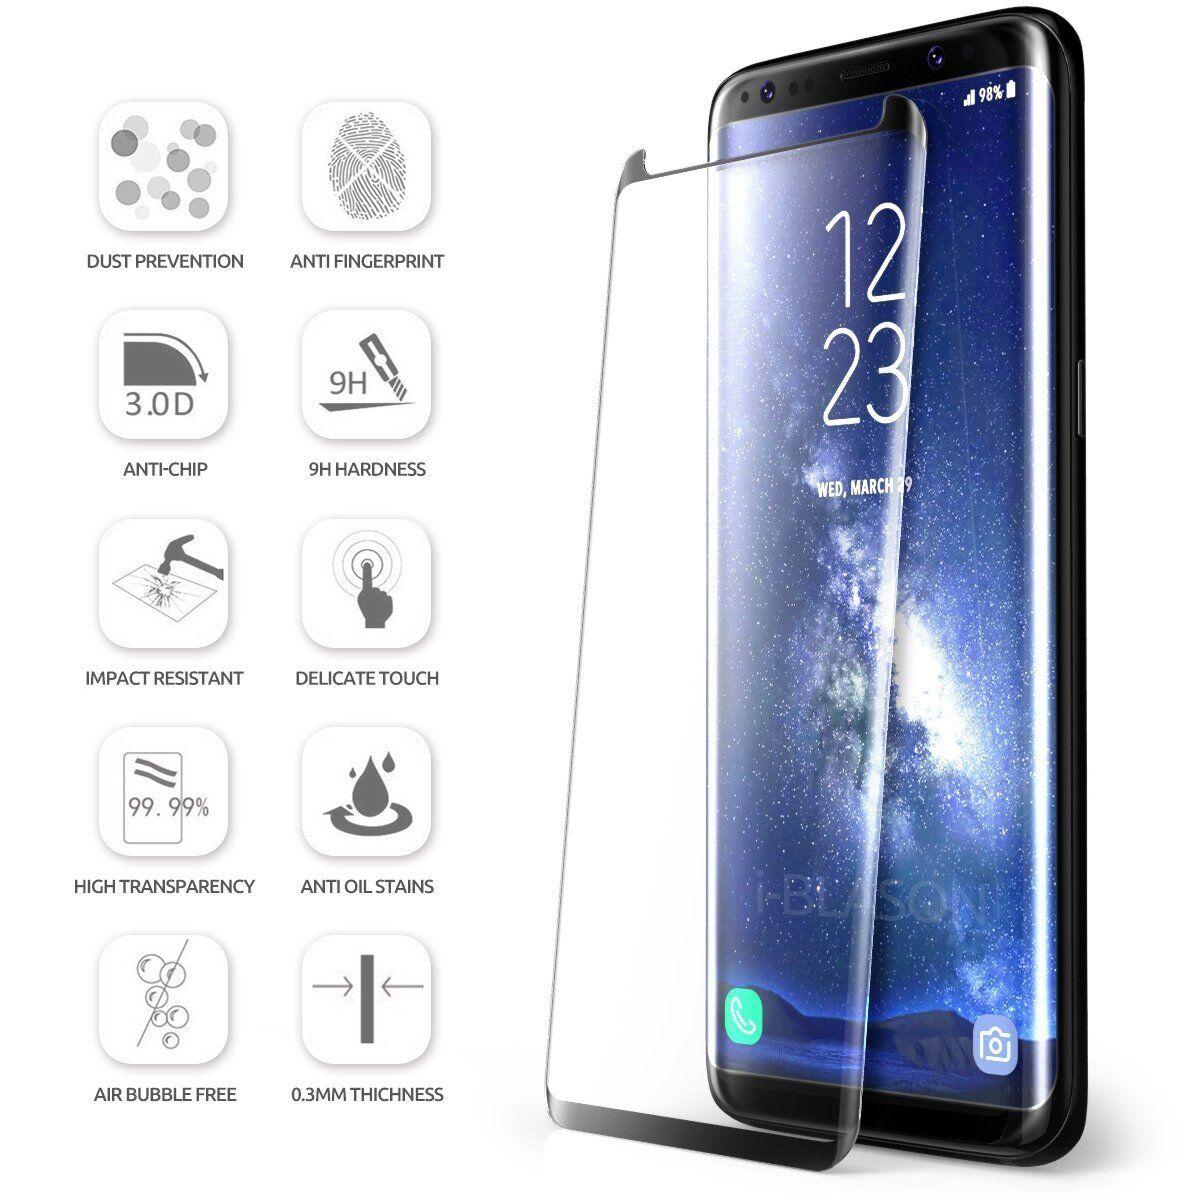 Купить Case Friendly Tempered Glass Screen Protector Samsung Galaxy Note 9 S9 / S8 Plus